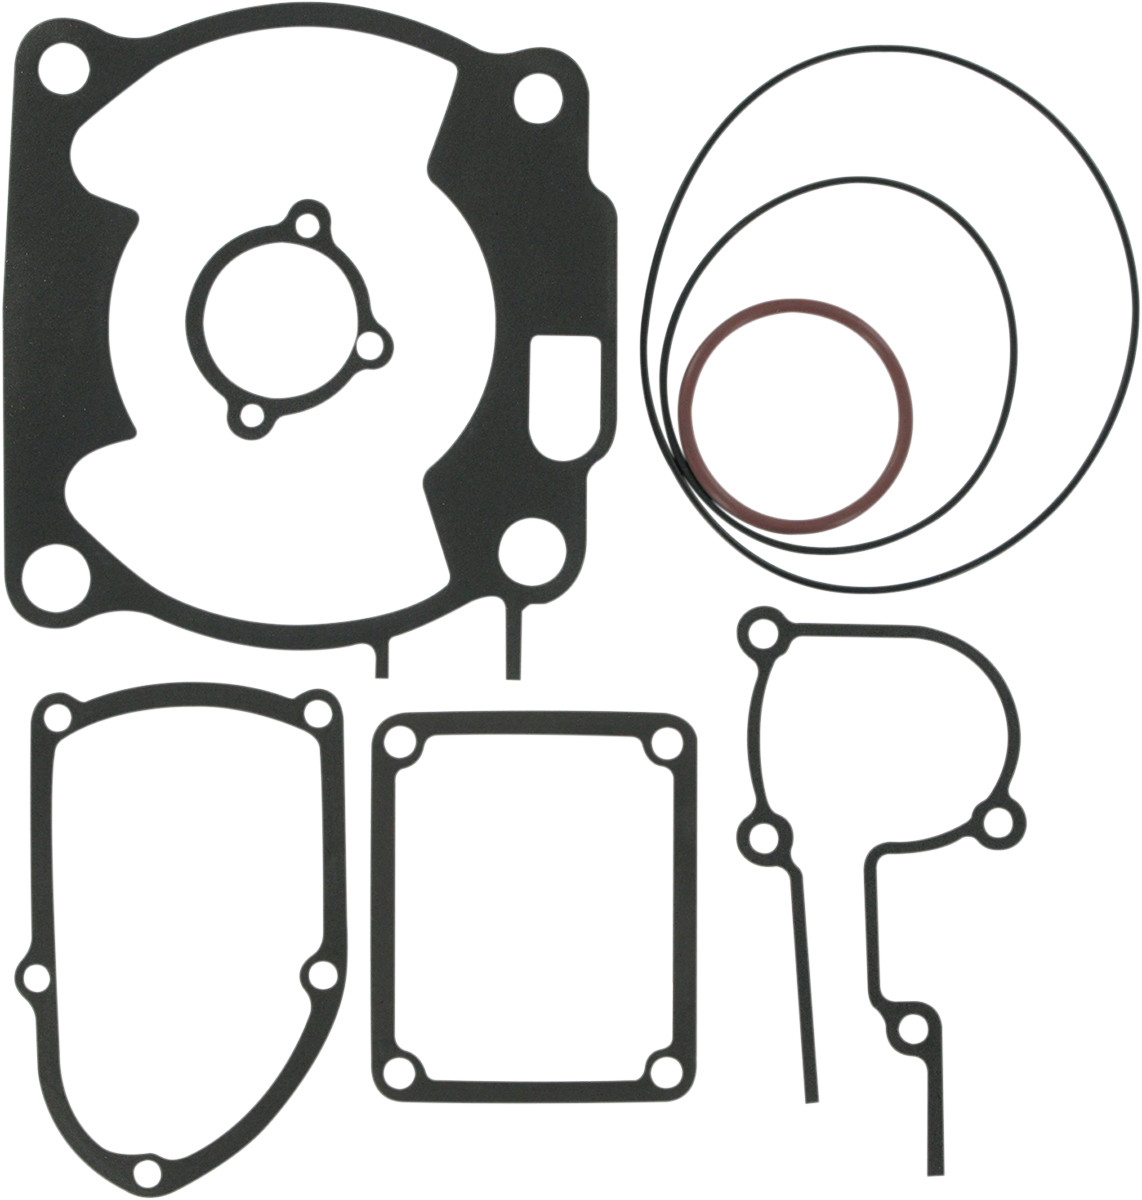 Cometic Top End Gasket Kit for Yamaha YZ 250 97-98 C7337